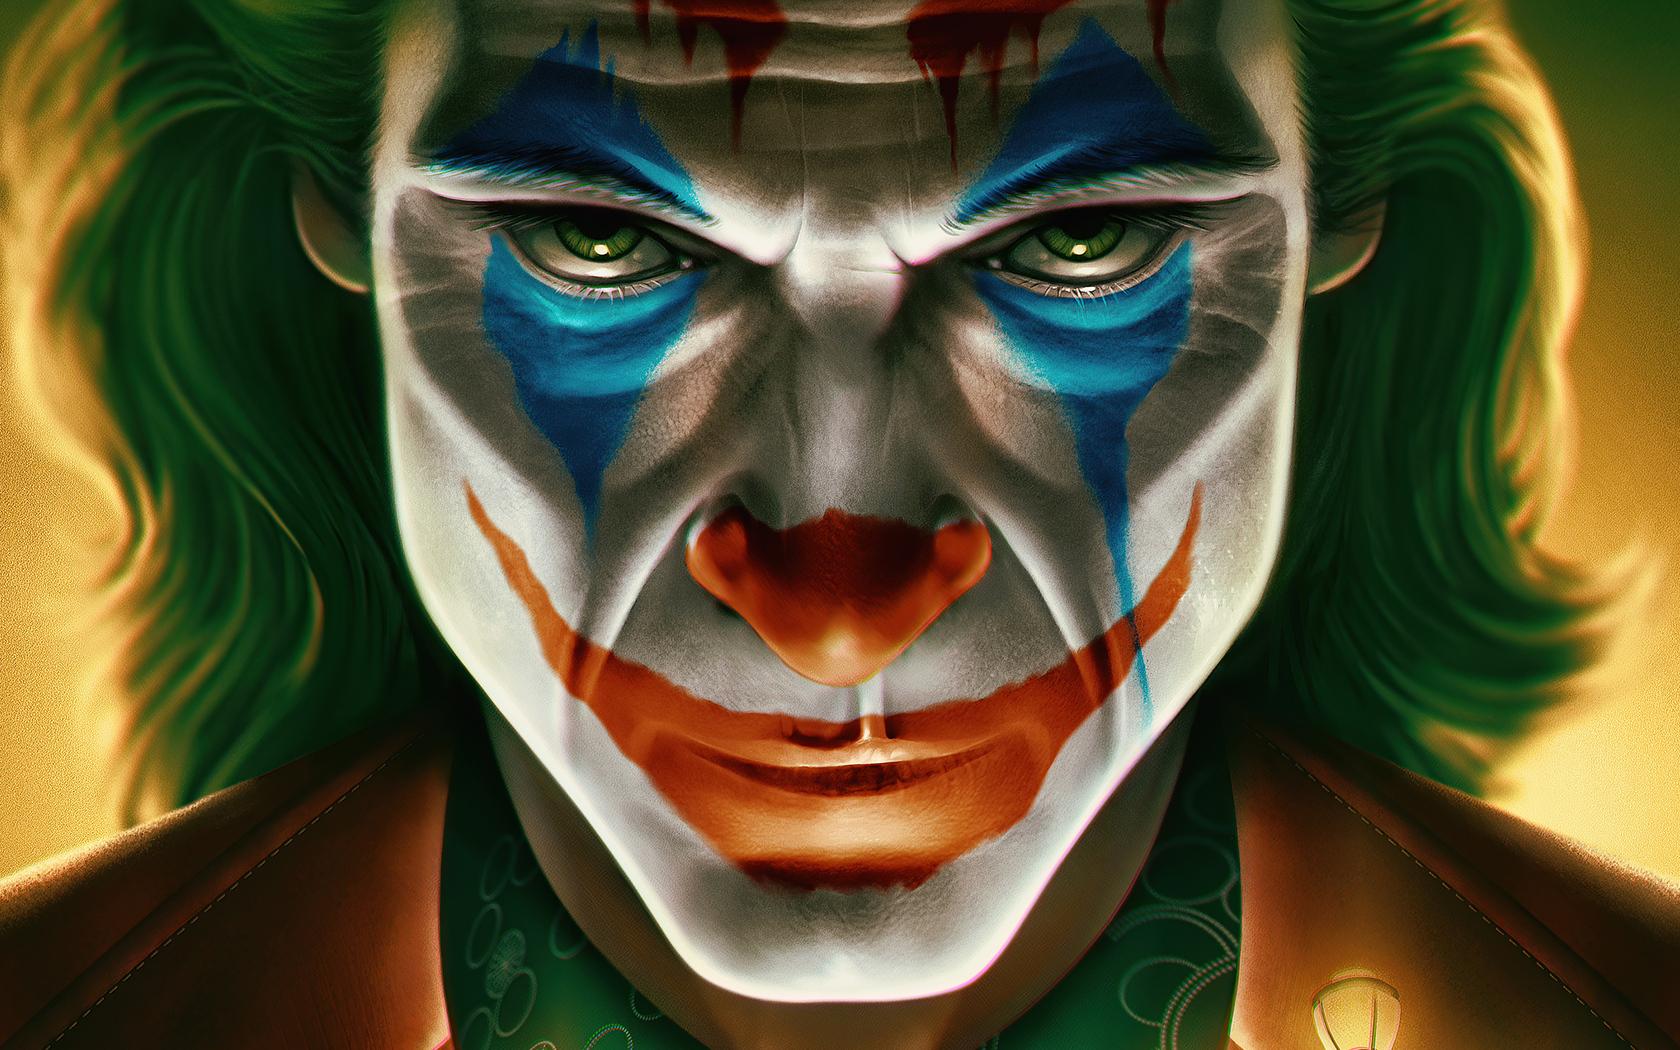 4k-joker-face-closeup-mx.jpg